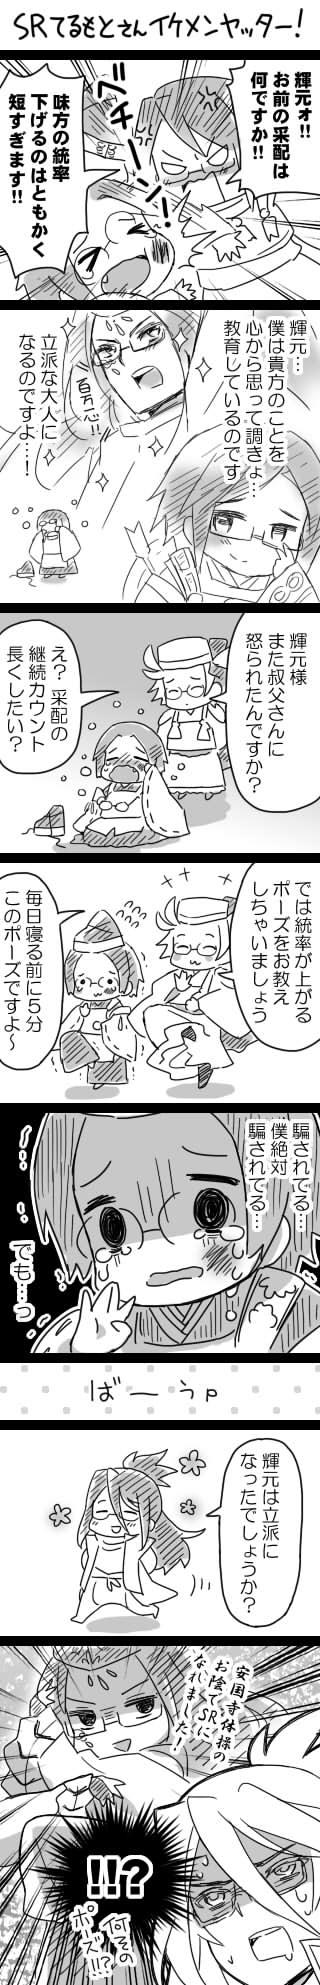 SRterumotosan.jpg